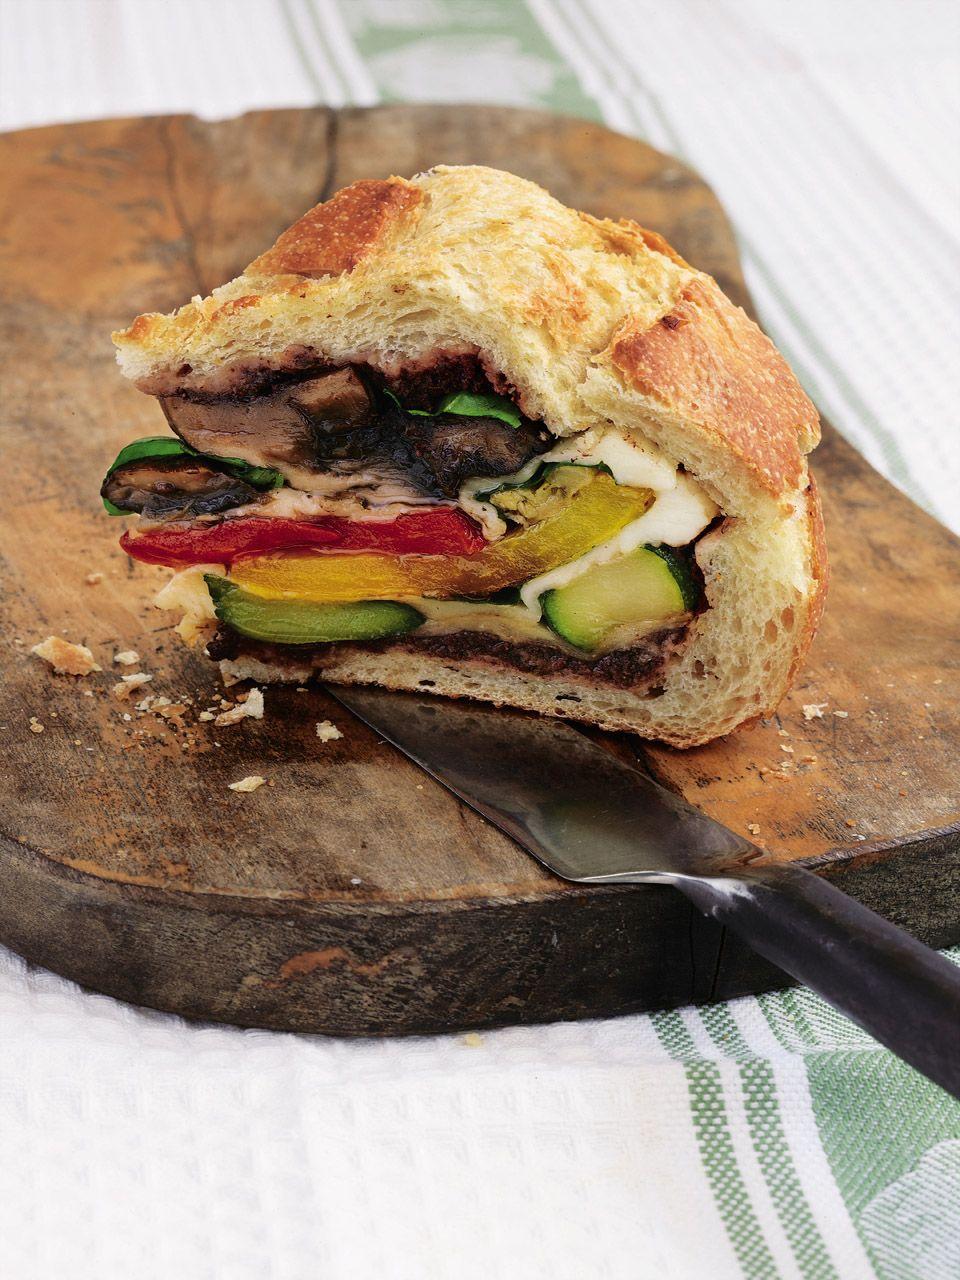 Picnic loaf recipe pan bagnat picnic recipes and picnics picnic loaf picnic recipeslunch box recipespicnic ideasvegetarian forumfinder Choice Image